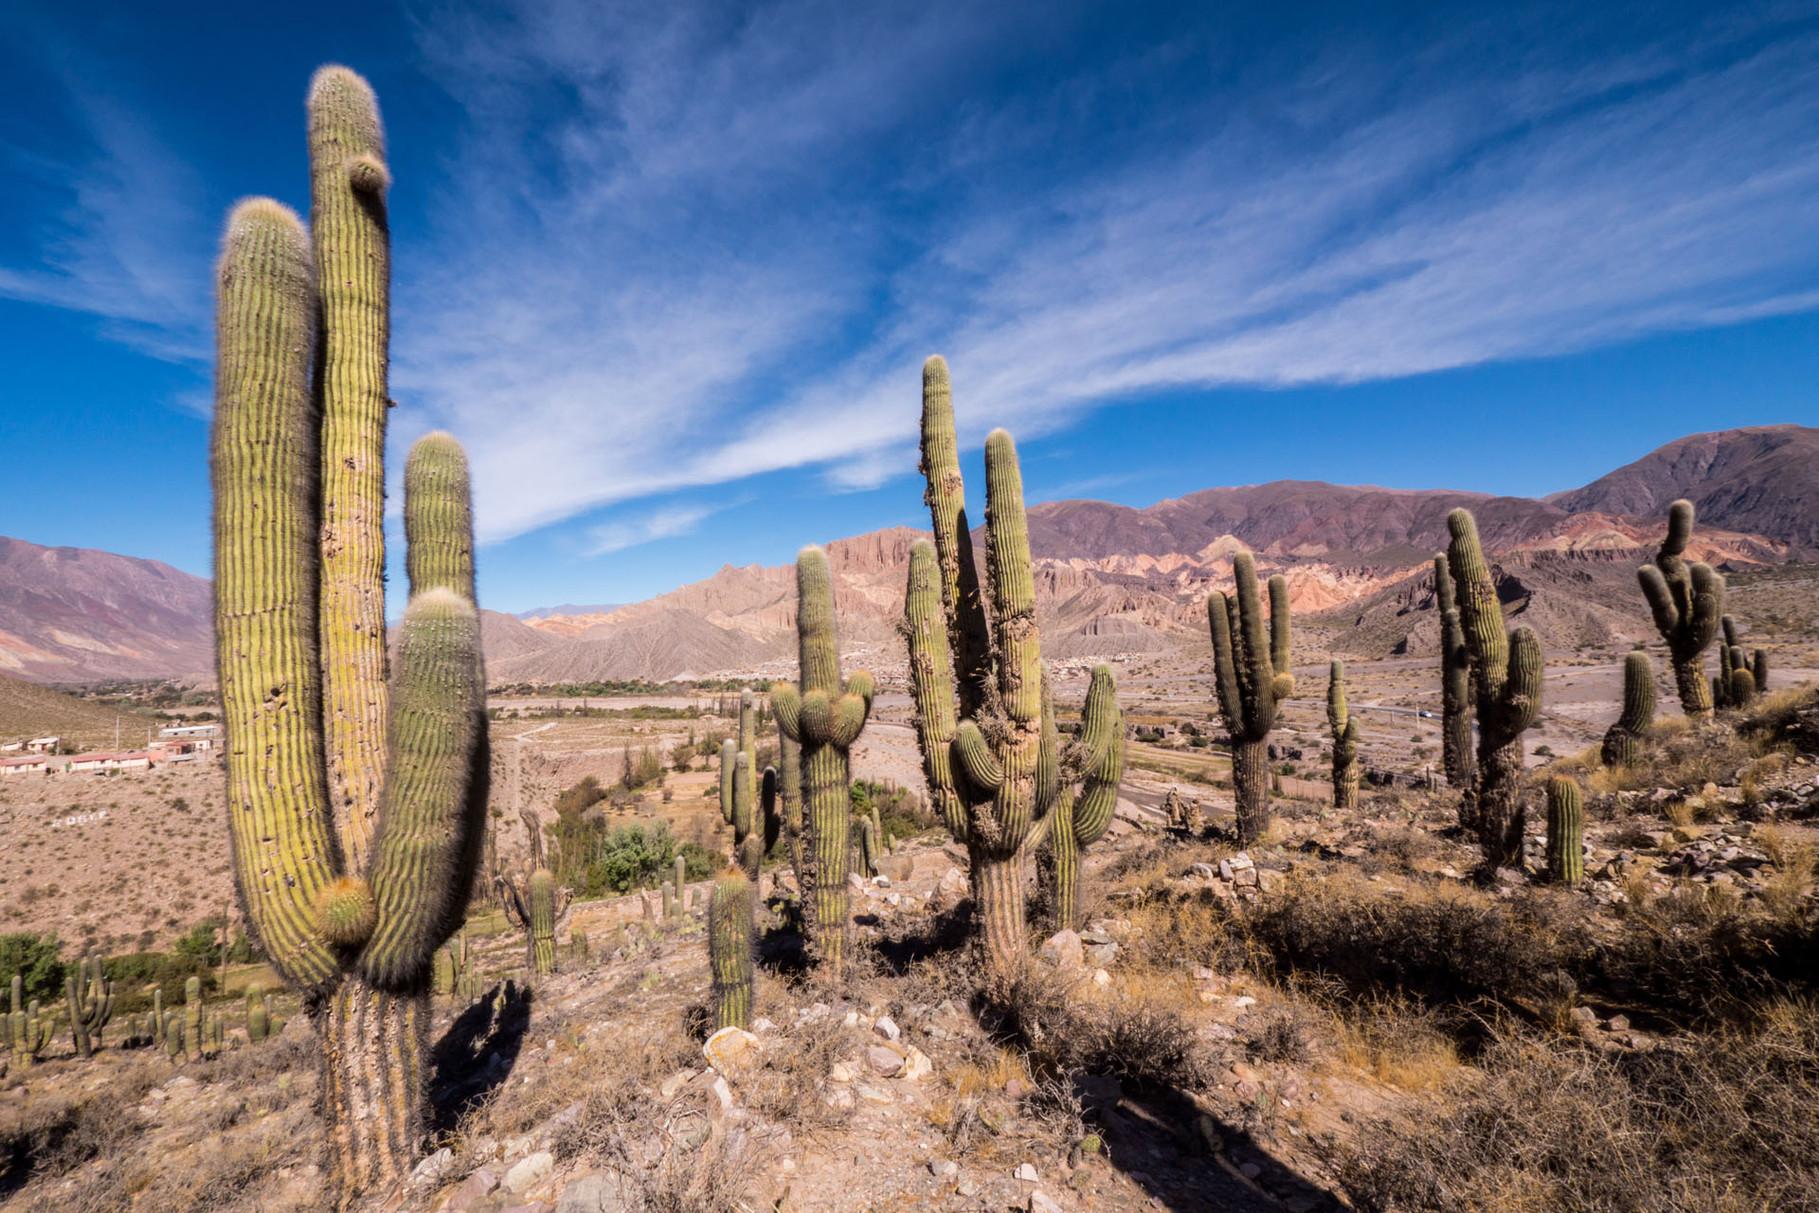 National park Los Cardones (cactus), near Cachi, Argentina